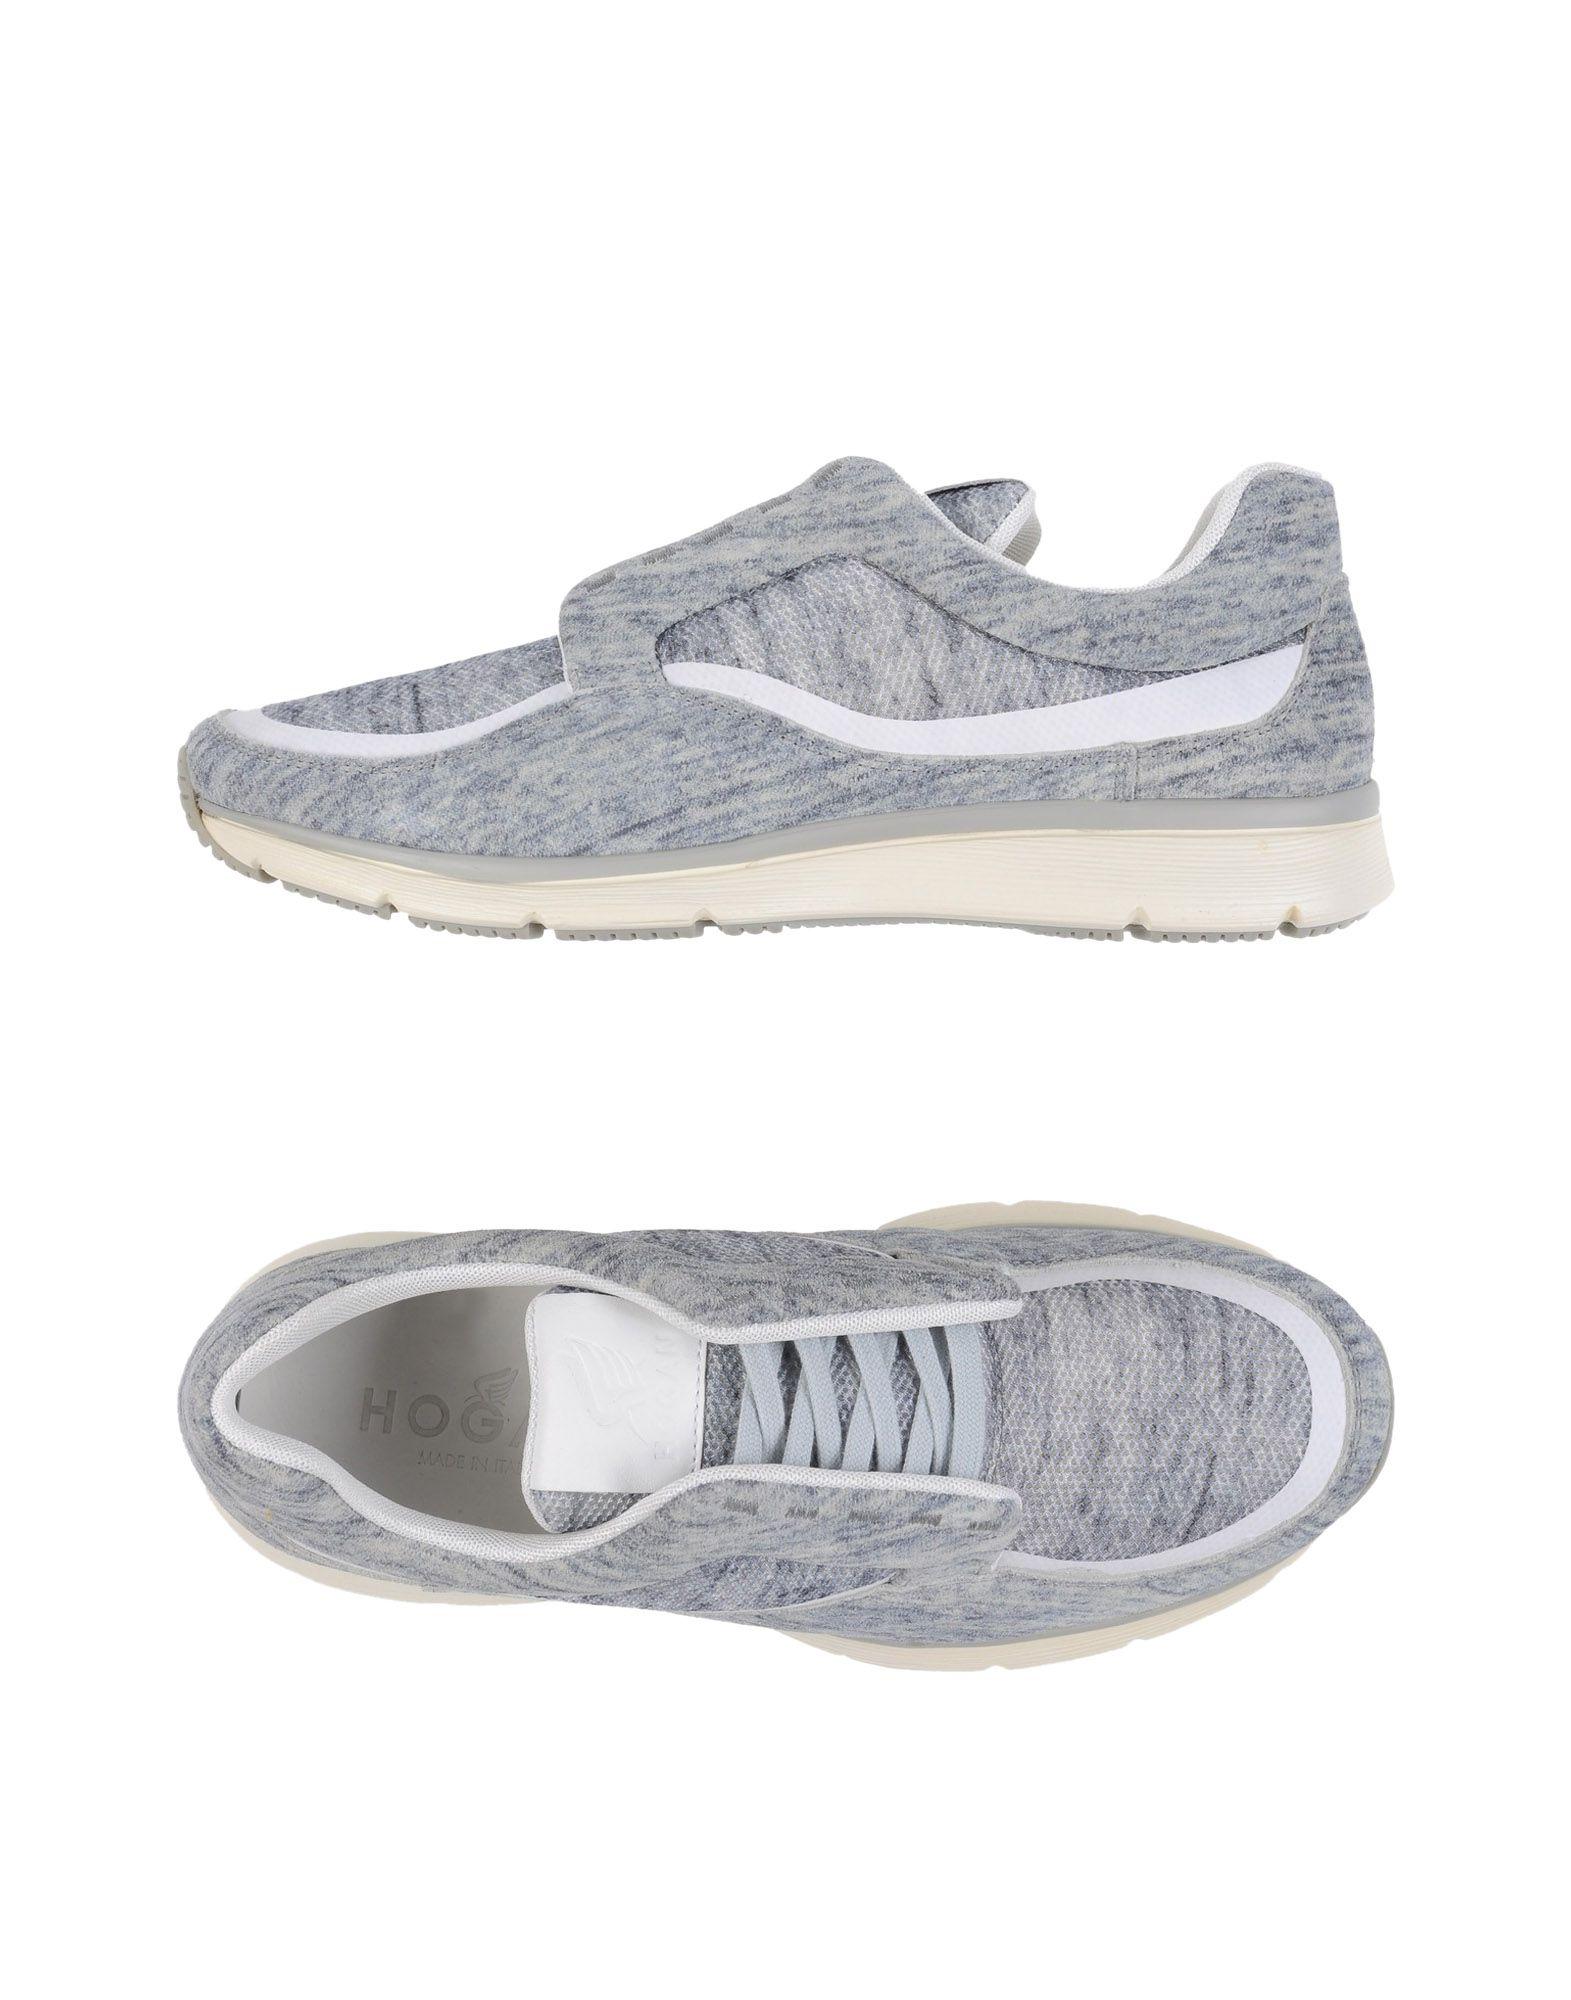 Hogan Sneakers Herren  11174824FX Gute Qualität beliebte Schuhe